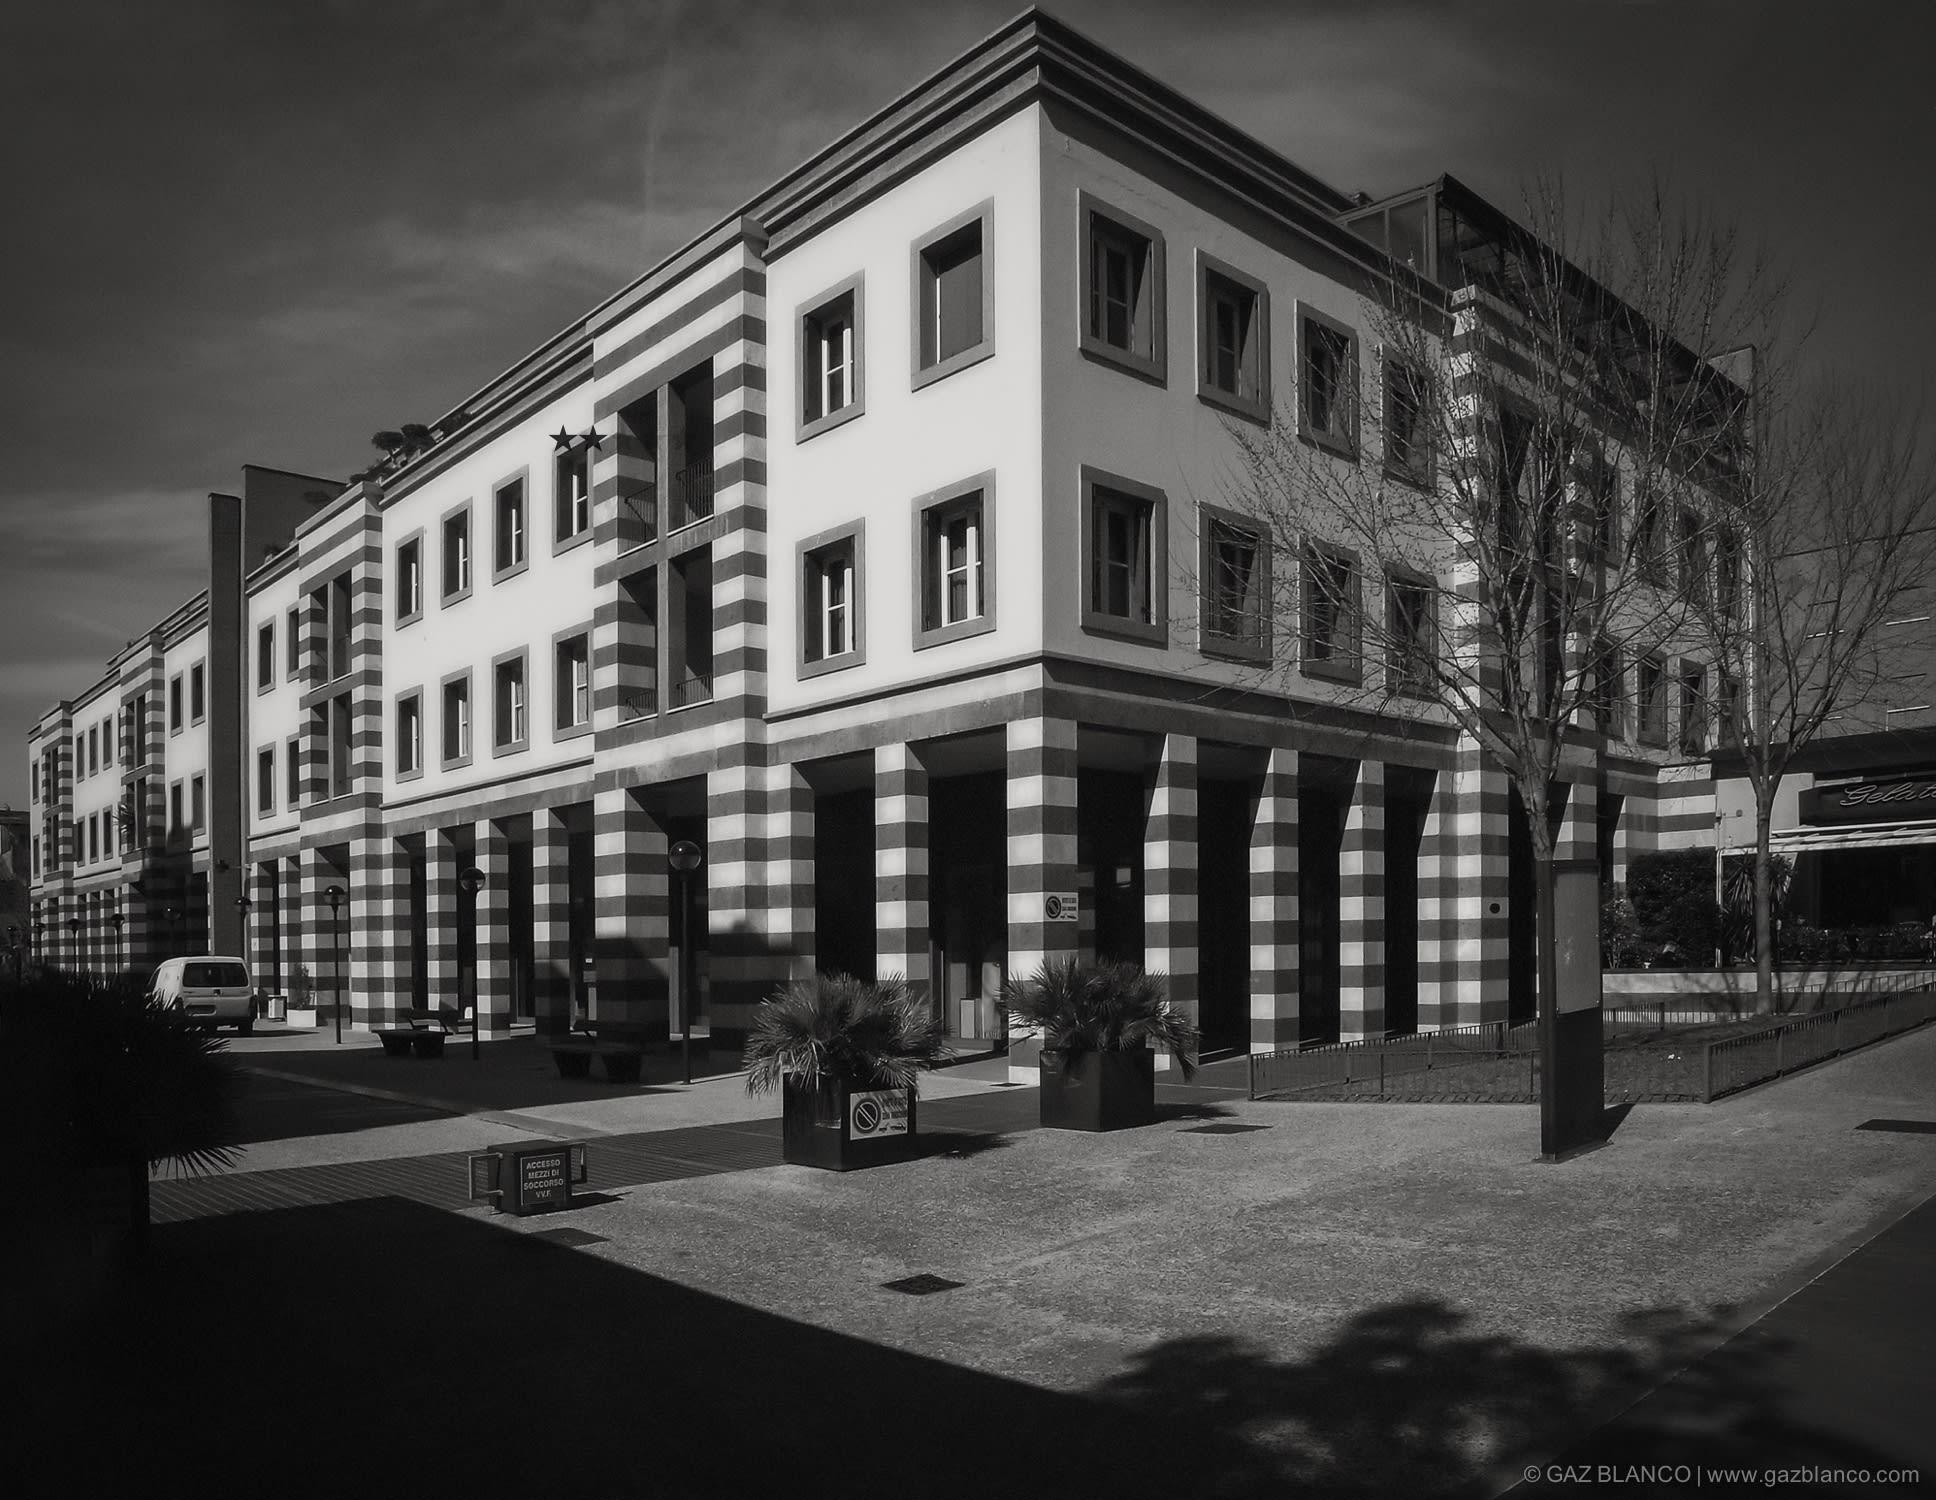 Aldo Rossi Gaz Blanco Ph Renovation Project Of Ex Kursaal